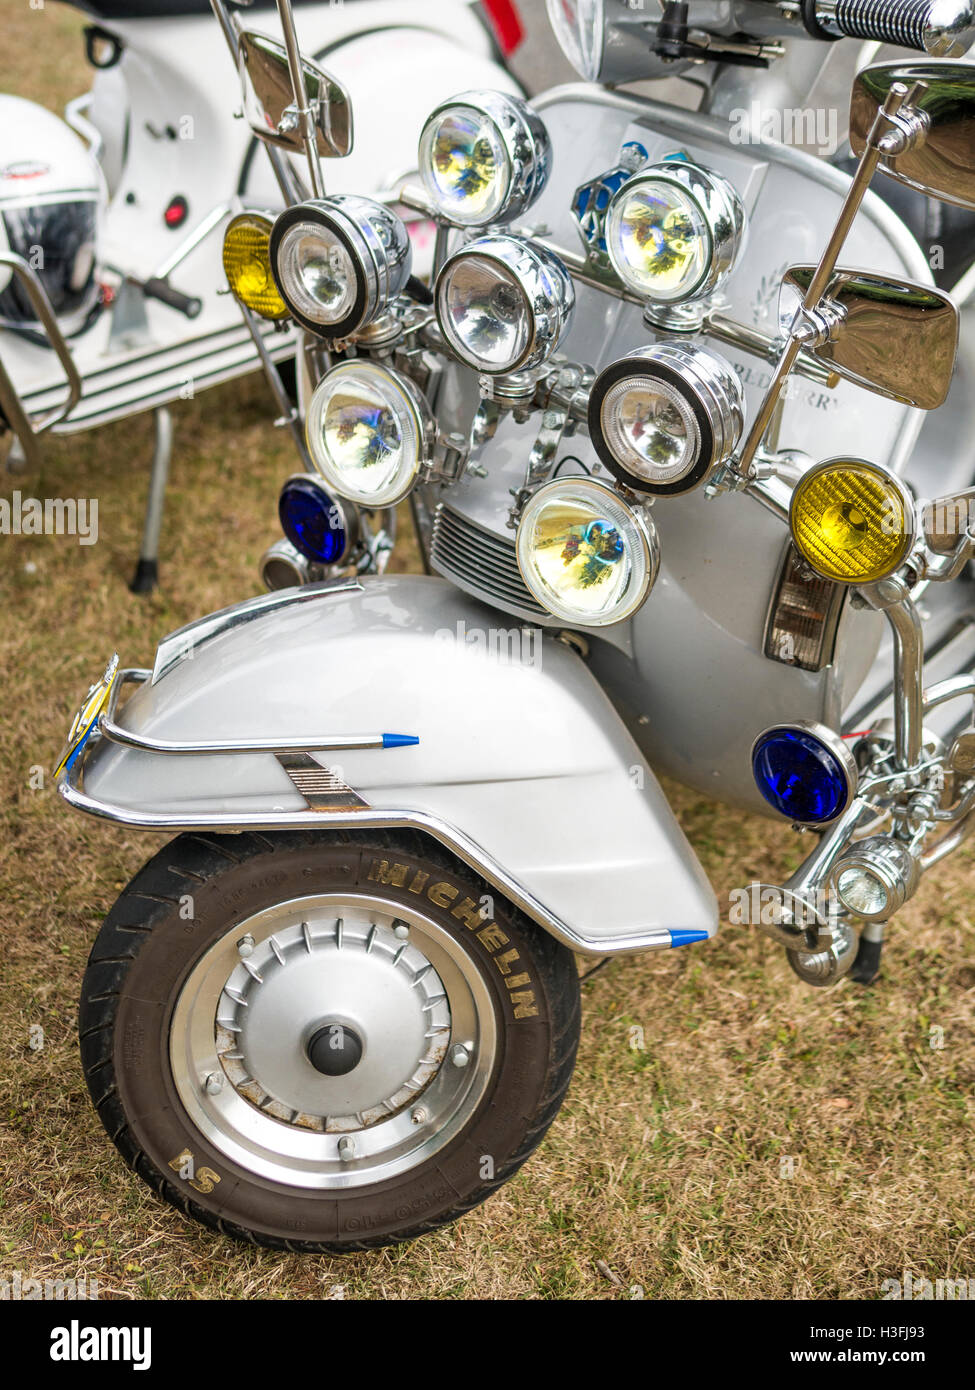 Vespa Scooter Headlight Detail - Stock Image